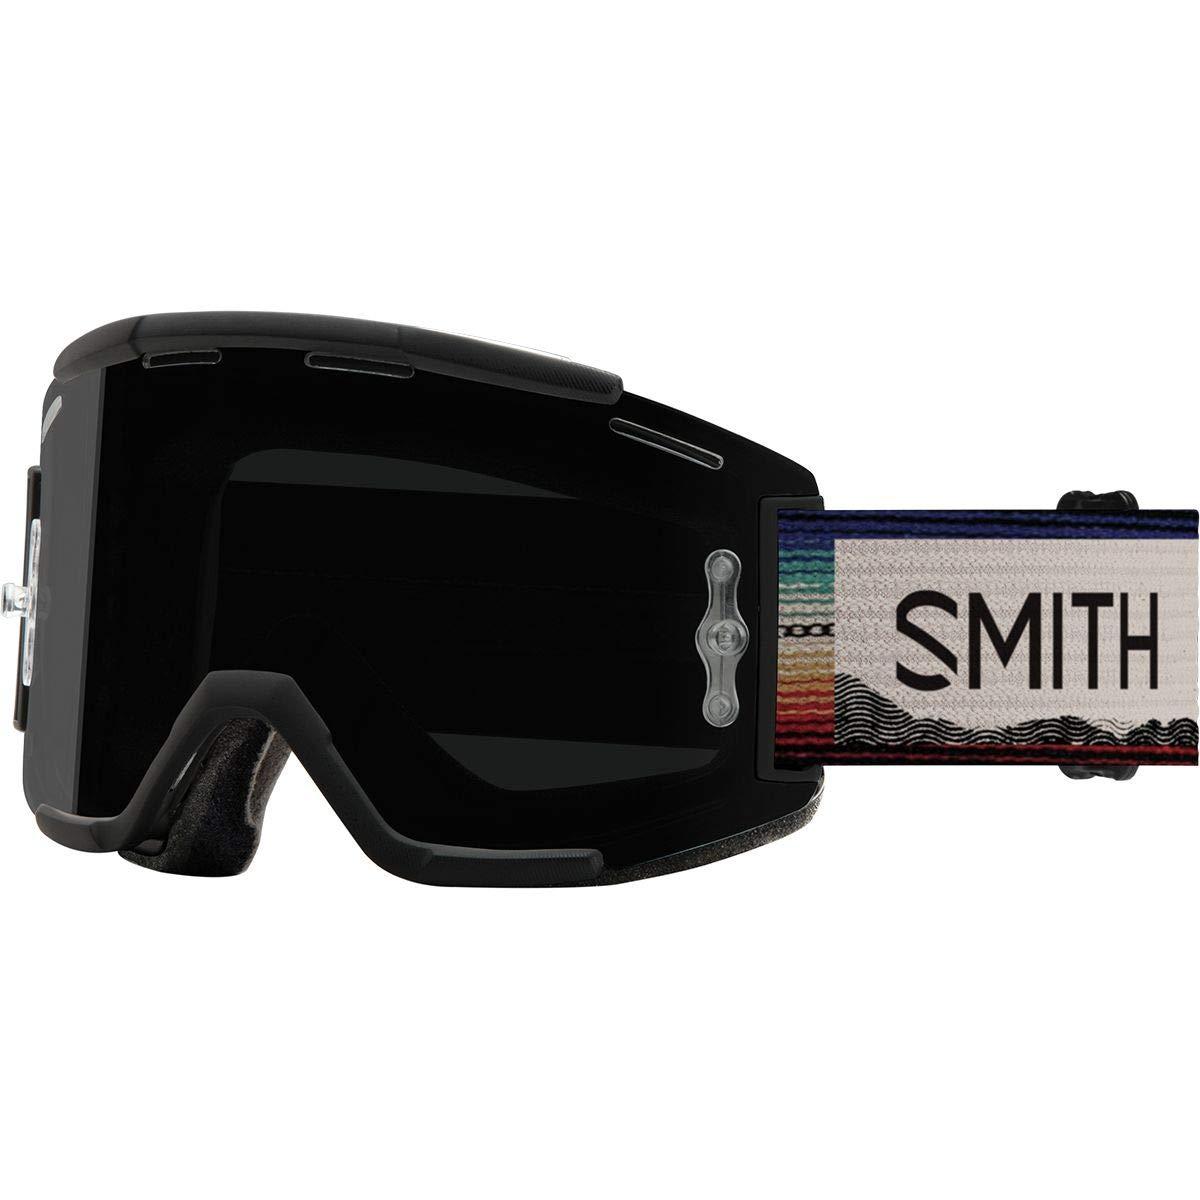 Amazon.com: Smith Squad MTB - Gafas de natación, talla única ...